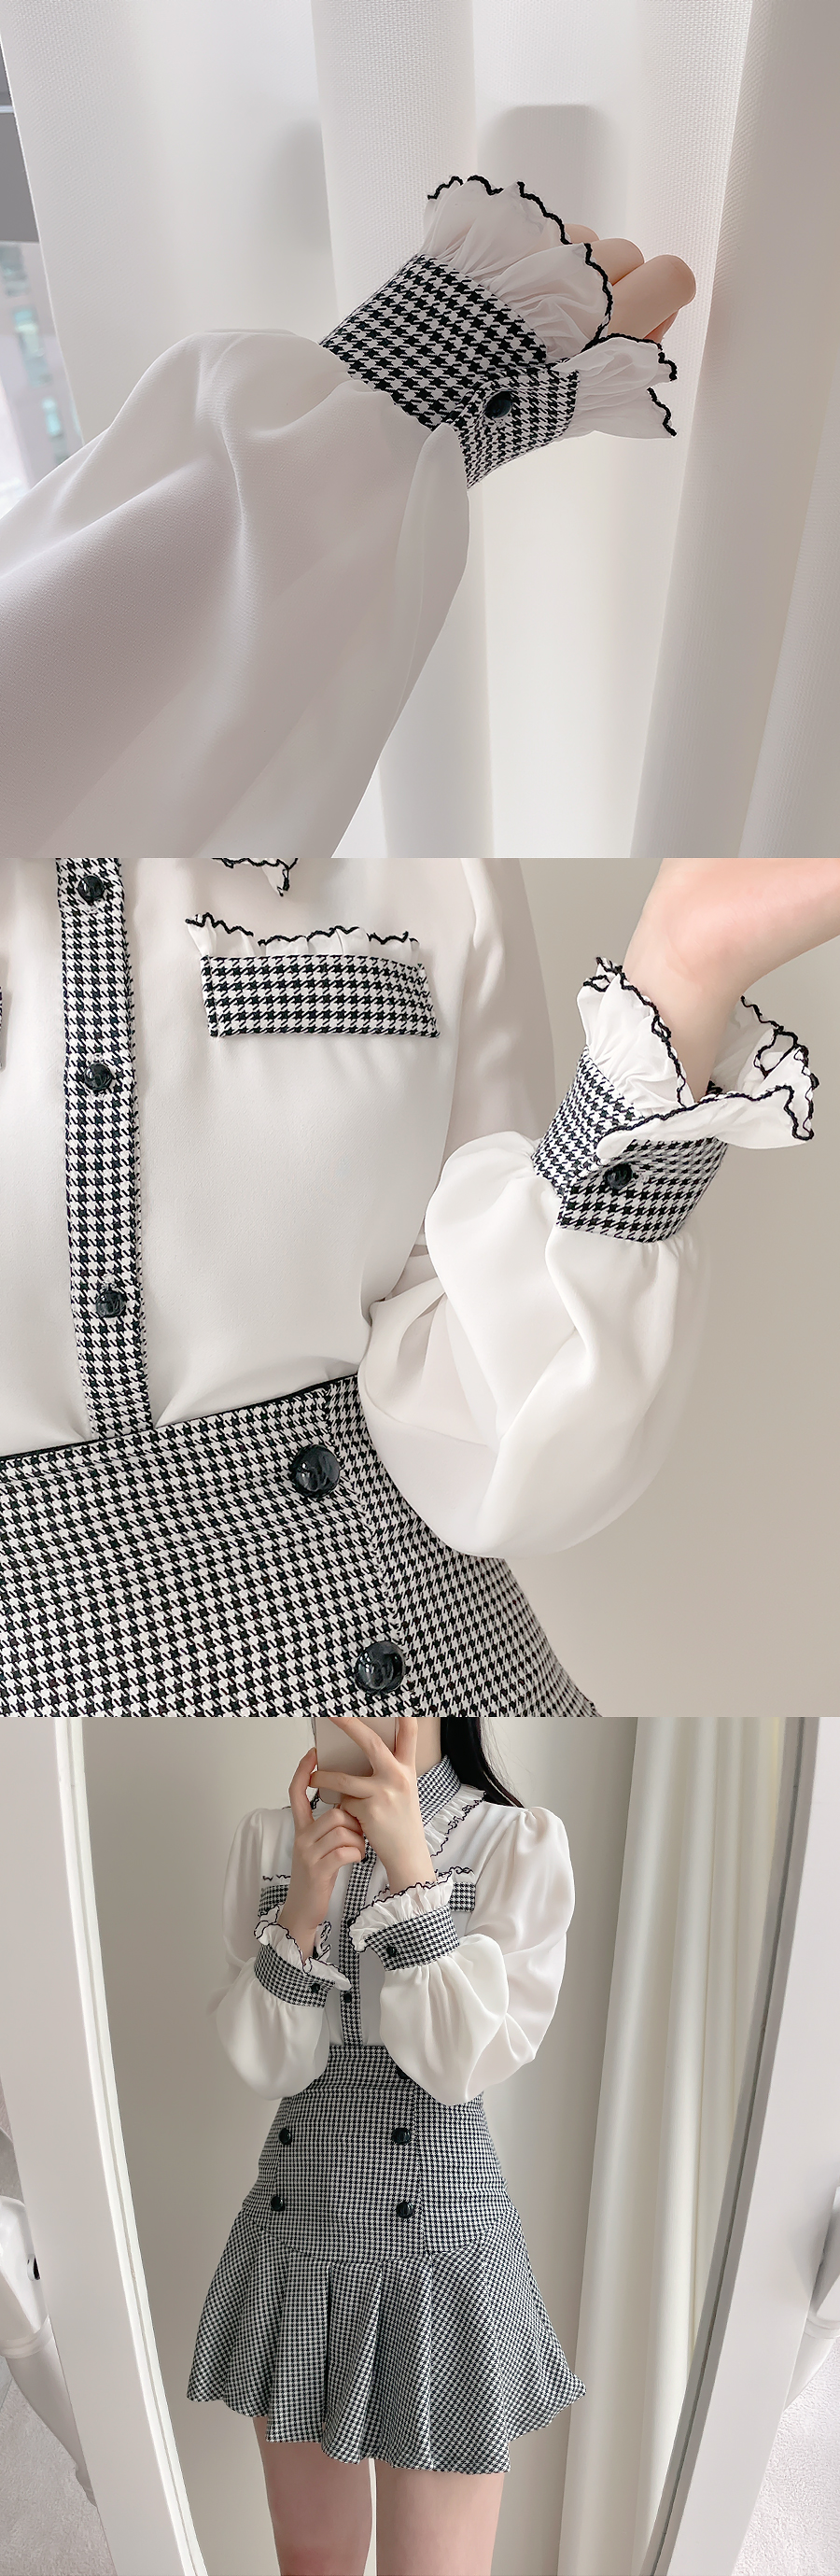 Luciel Hound Color Collar Blouse 2color